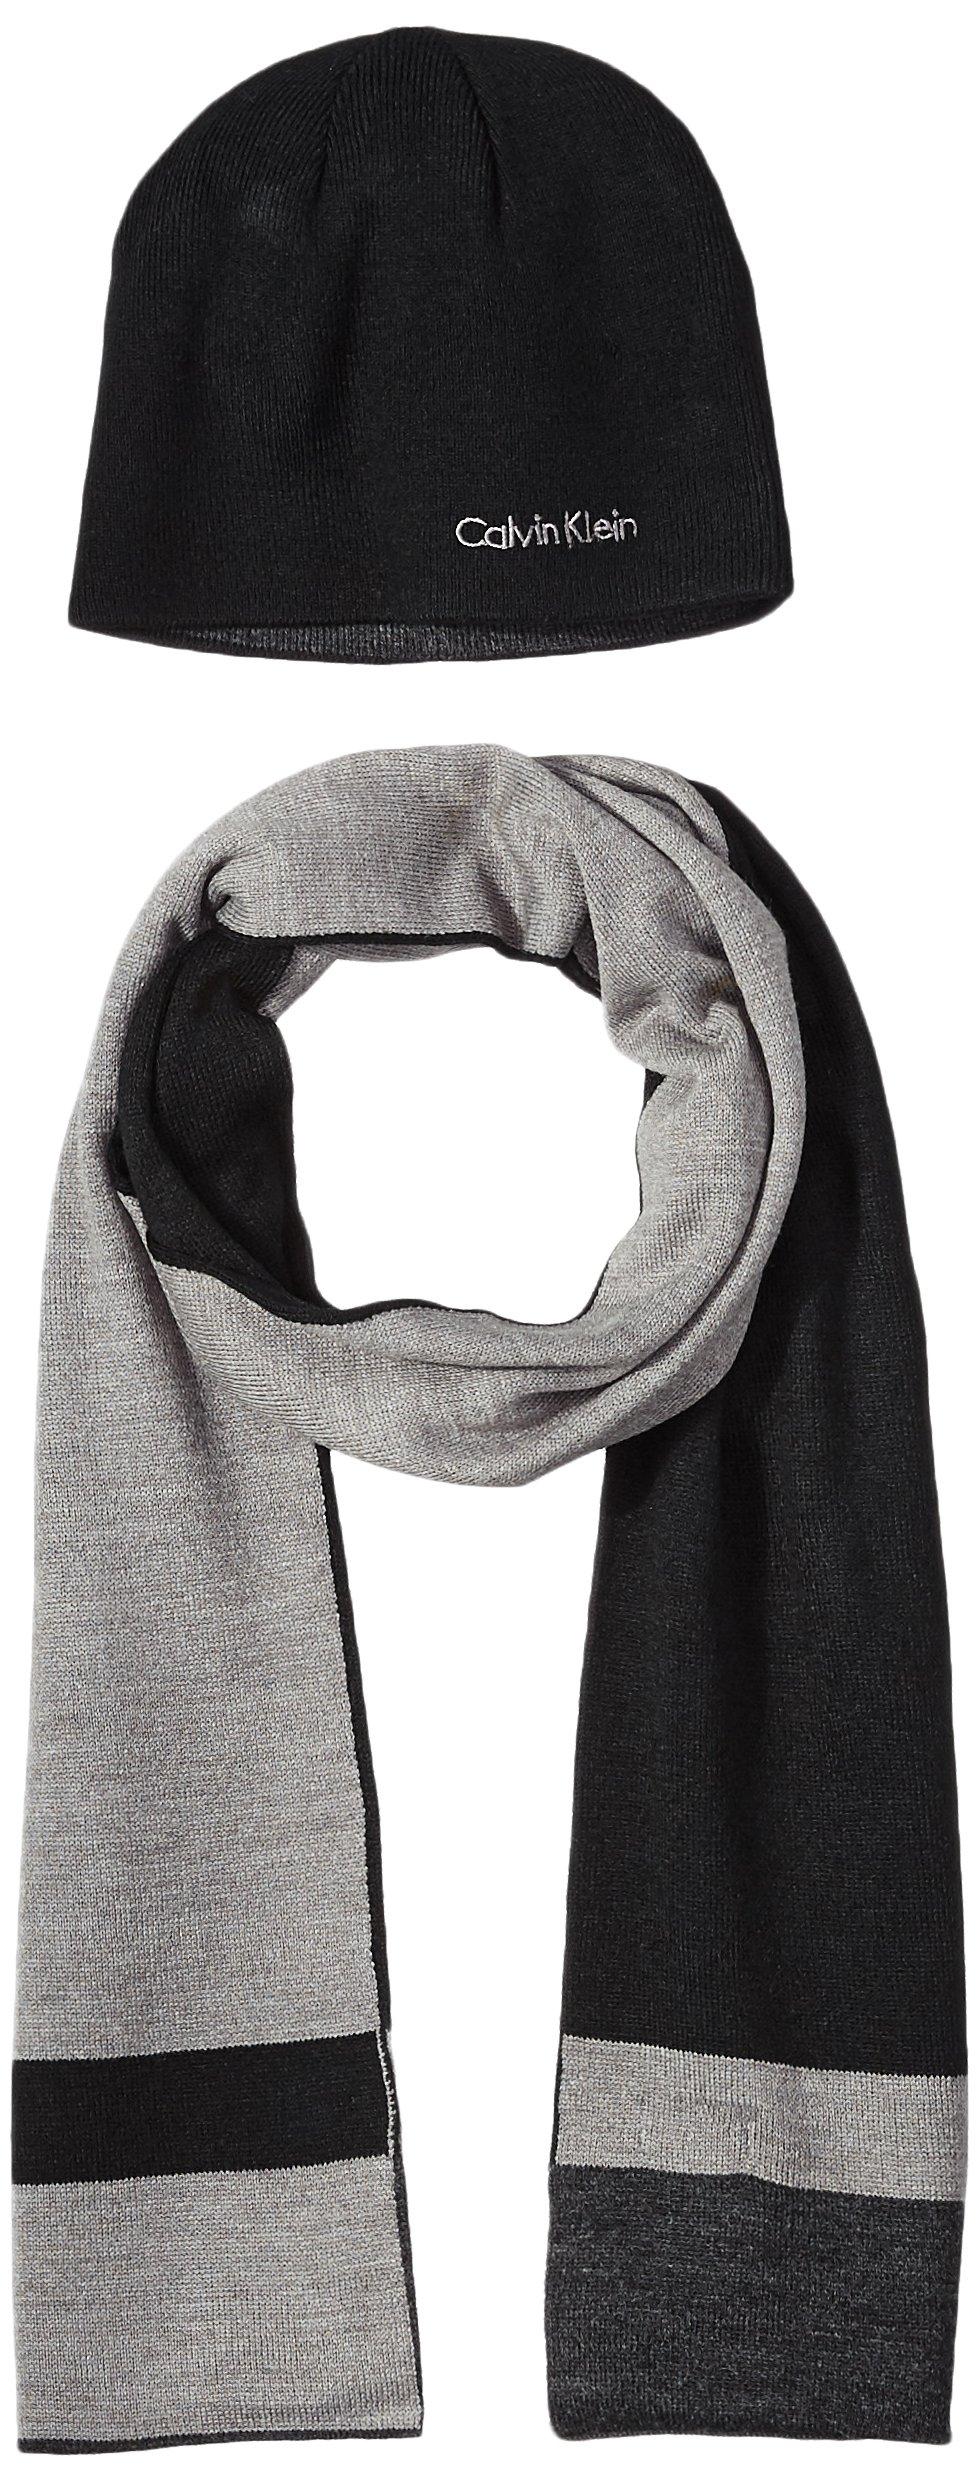 Calvin Klein Men's Hat and Scarf Set, Black/Heather Gray, One Size